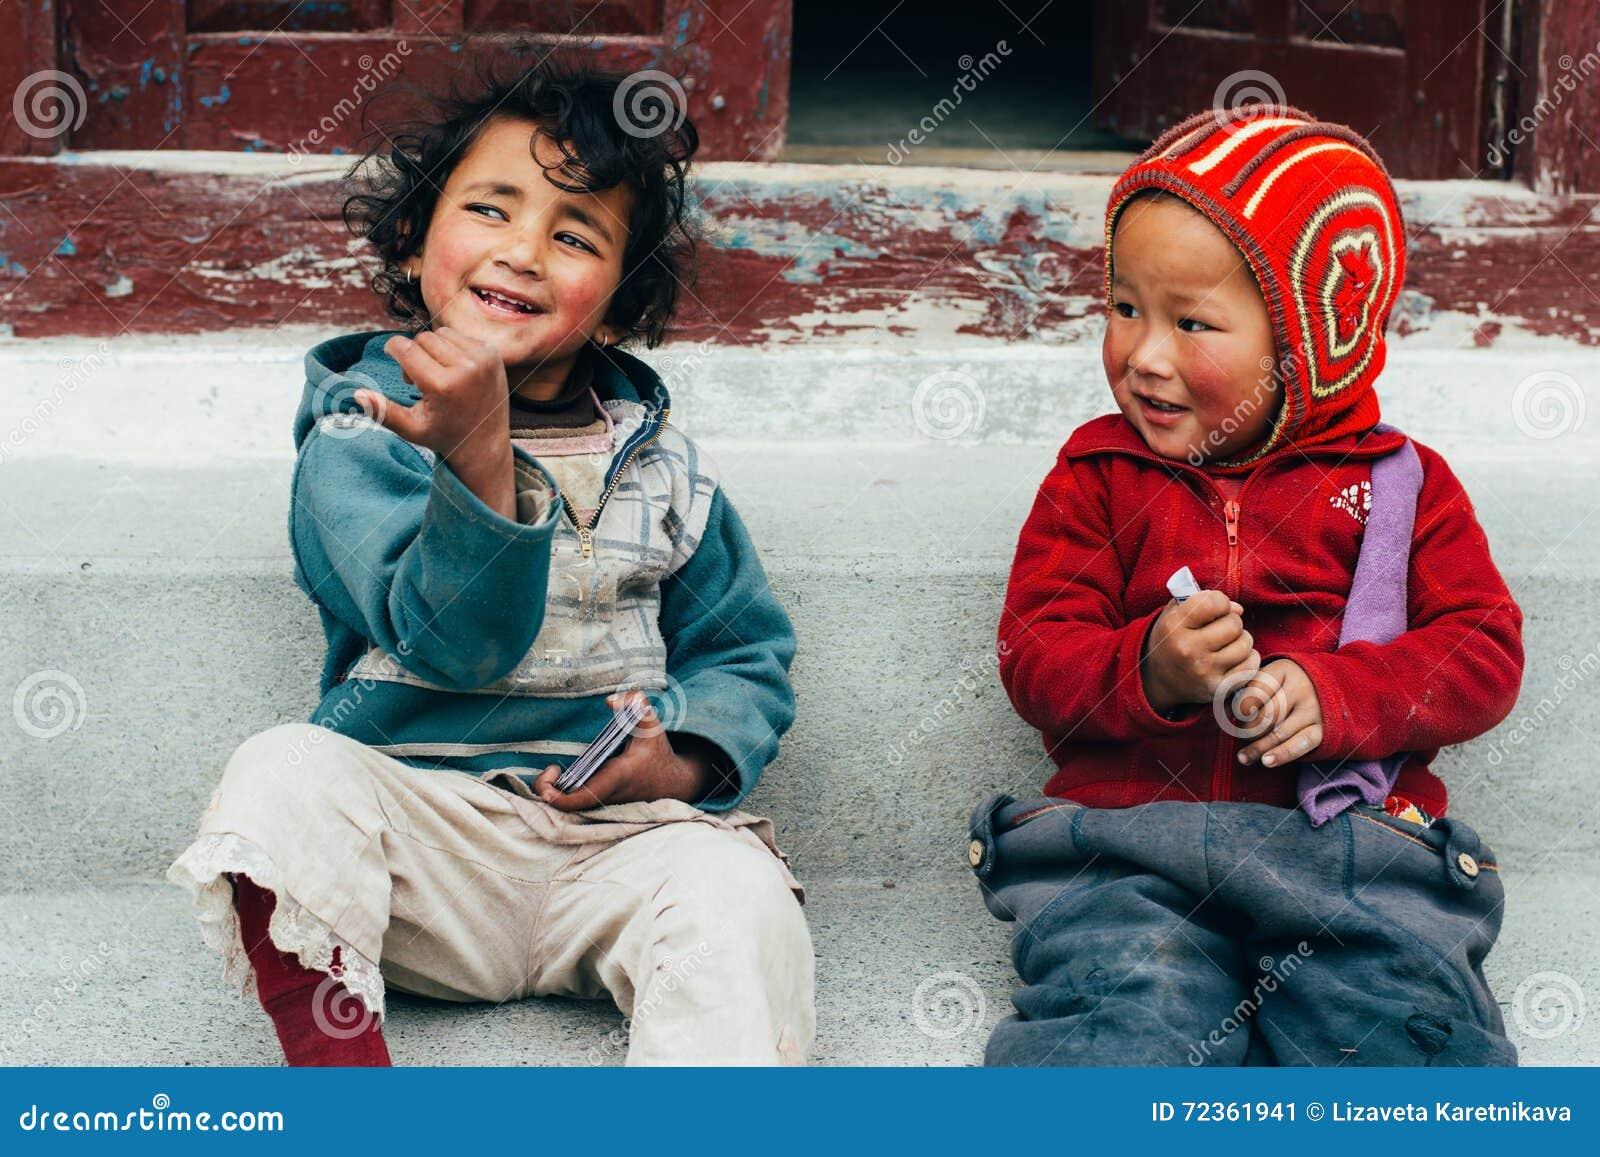 Marpha -第27 4月, 2015年-两未认出的孩子在村庄Marpha,尼泊尔